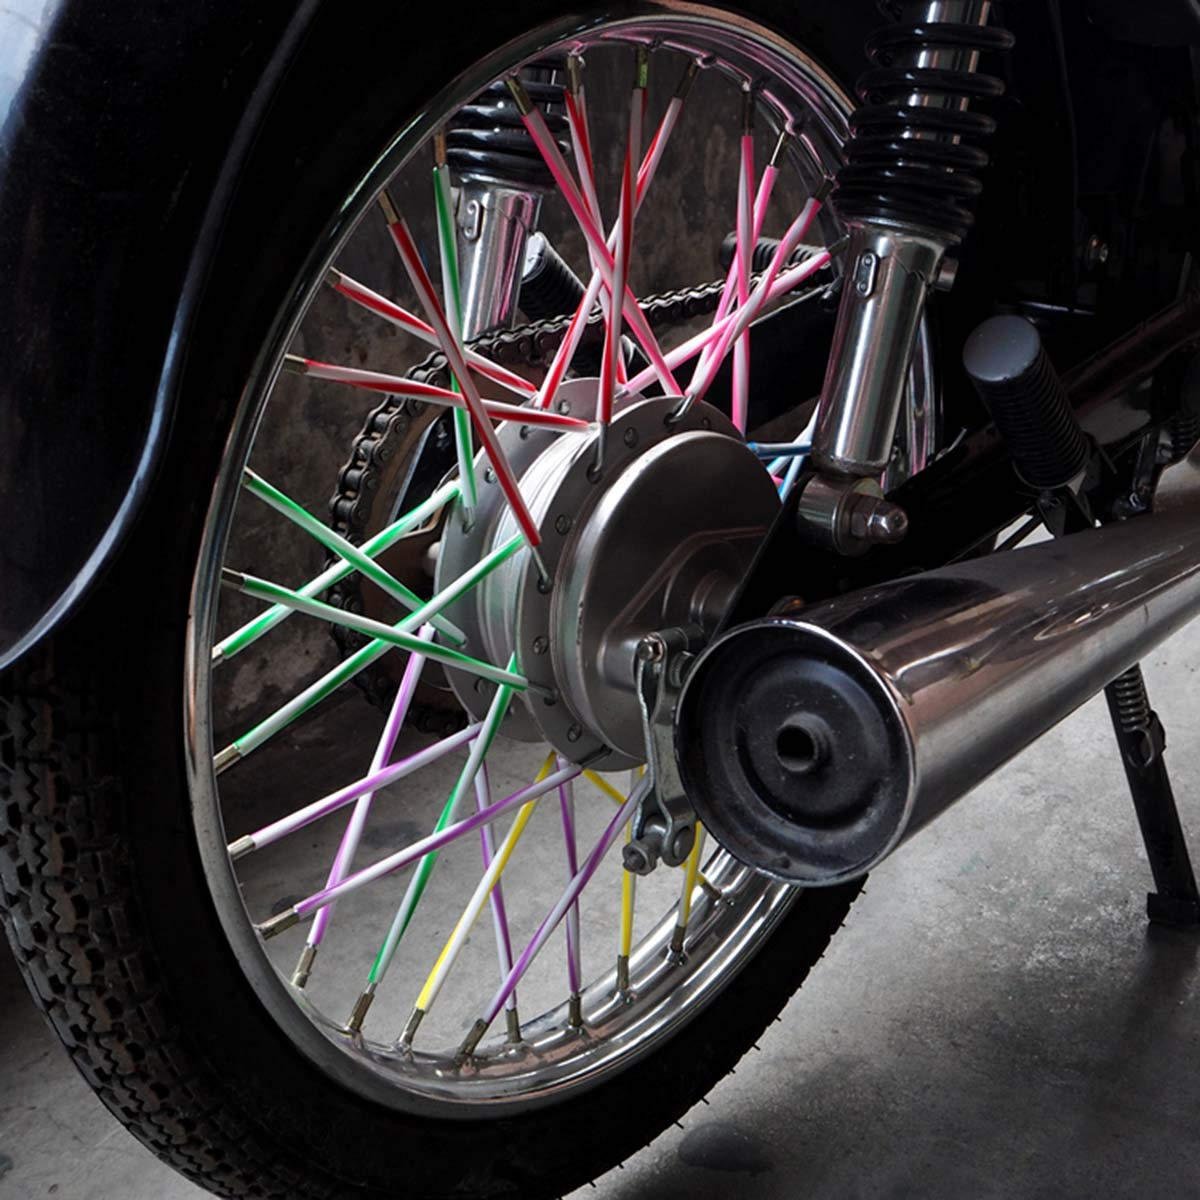 Blue-White LIOOBO 72pcs Spoke Skins Covers Motorcycle Motocross Dirt Bike MTB Wheel Rim Spoke Wraps Protector Kit